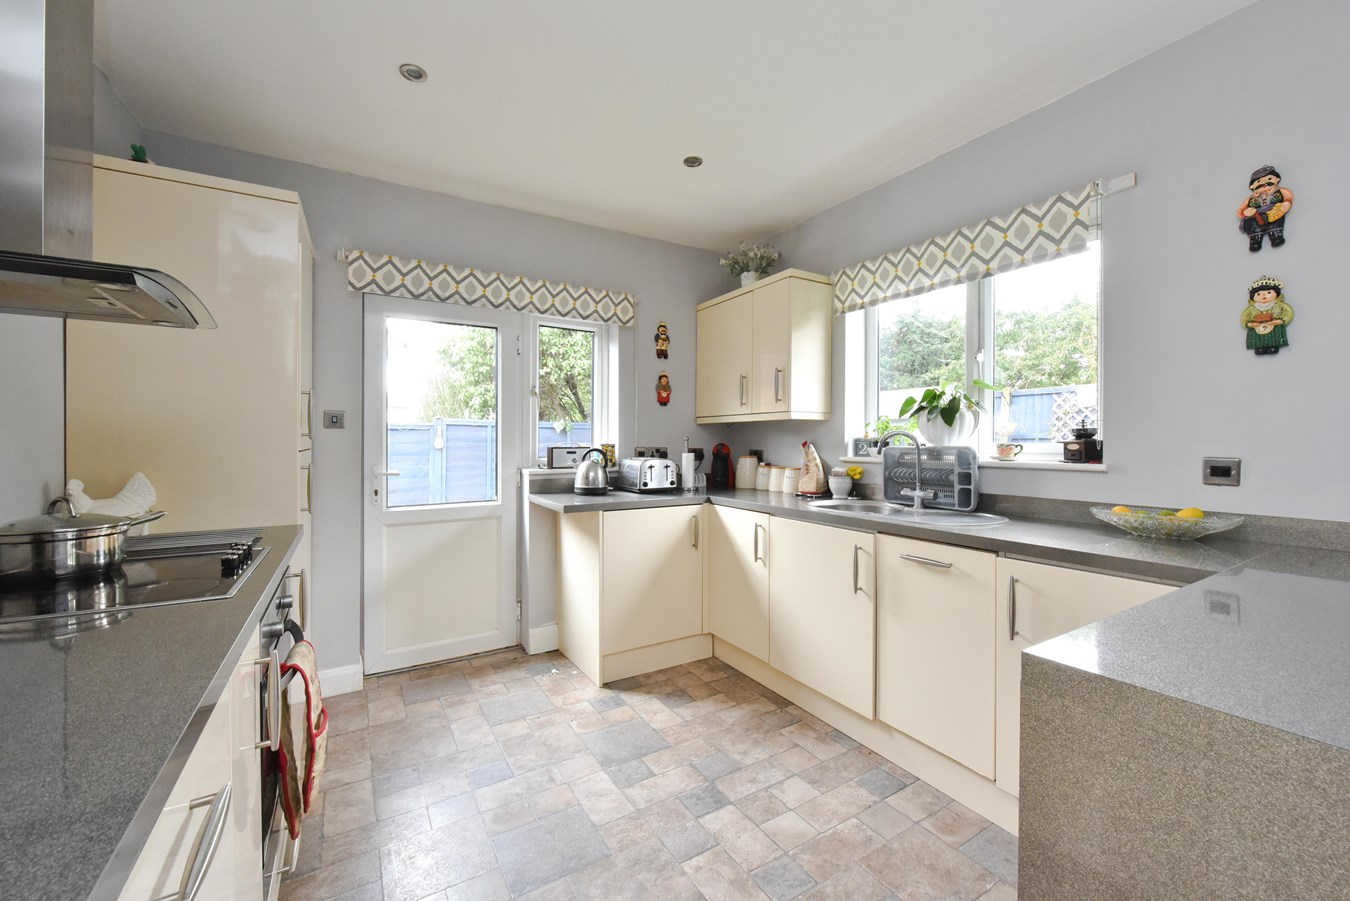 2 bedroom bungalow for sale in Oakmere Close, Potters Bar EN6, London